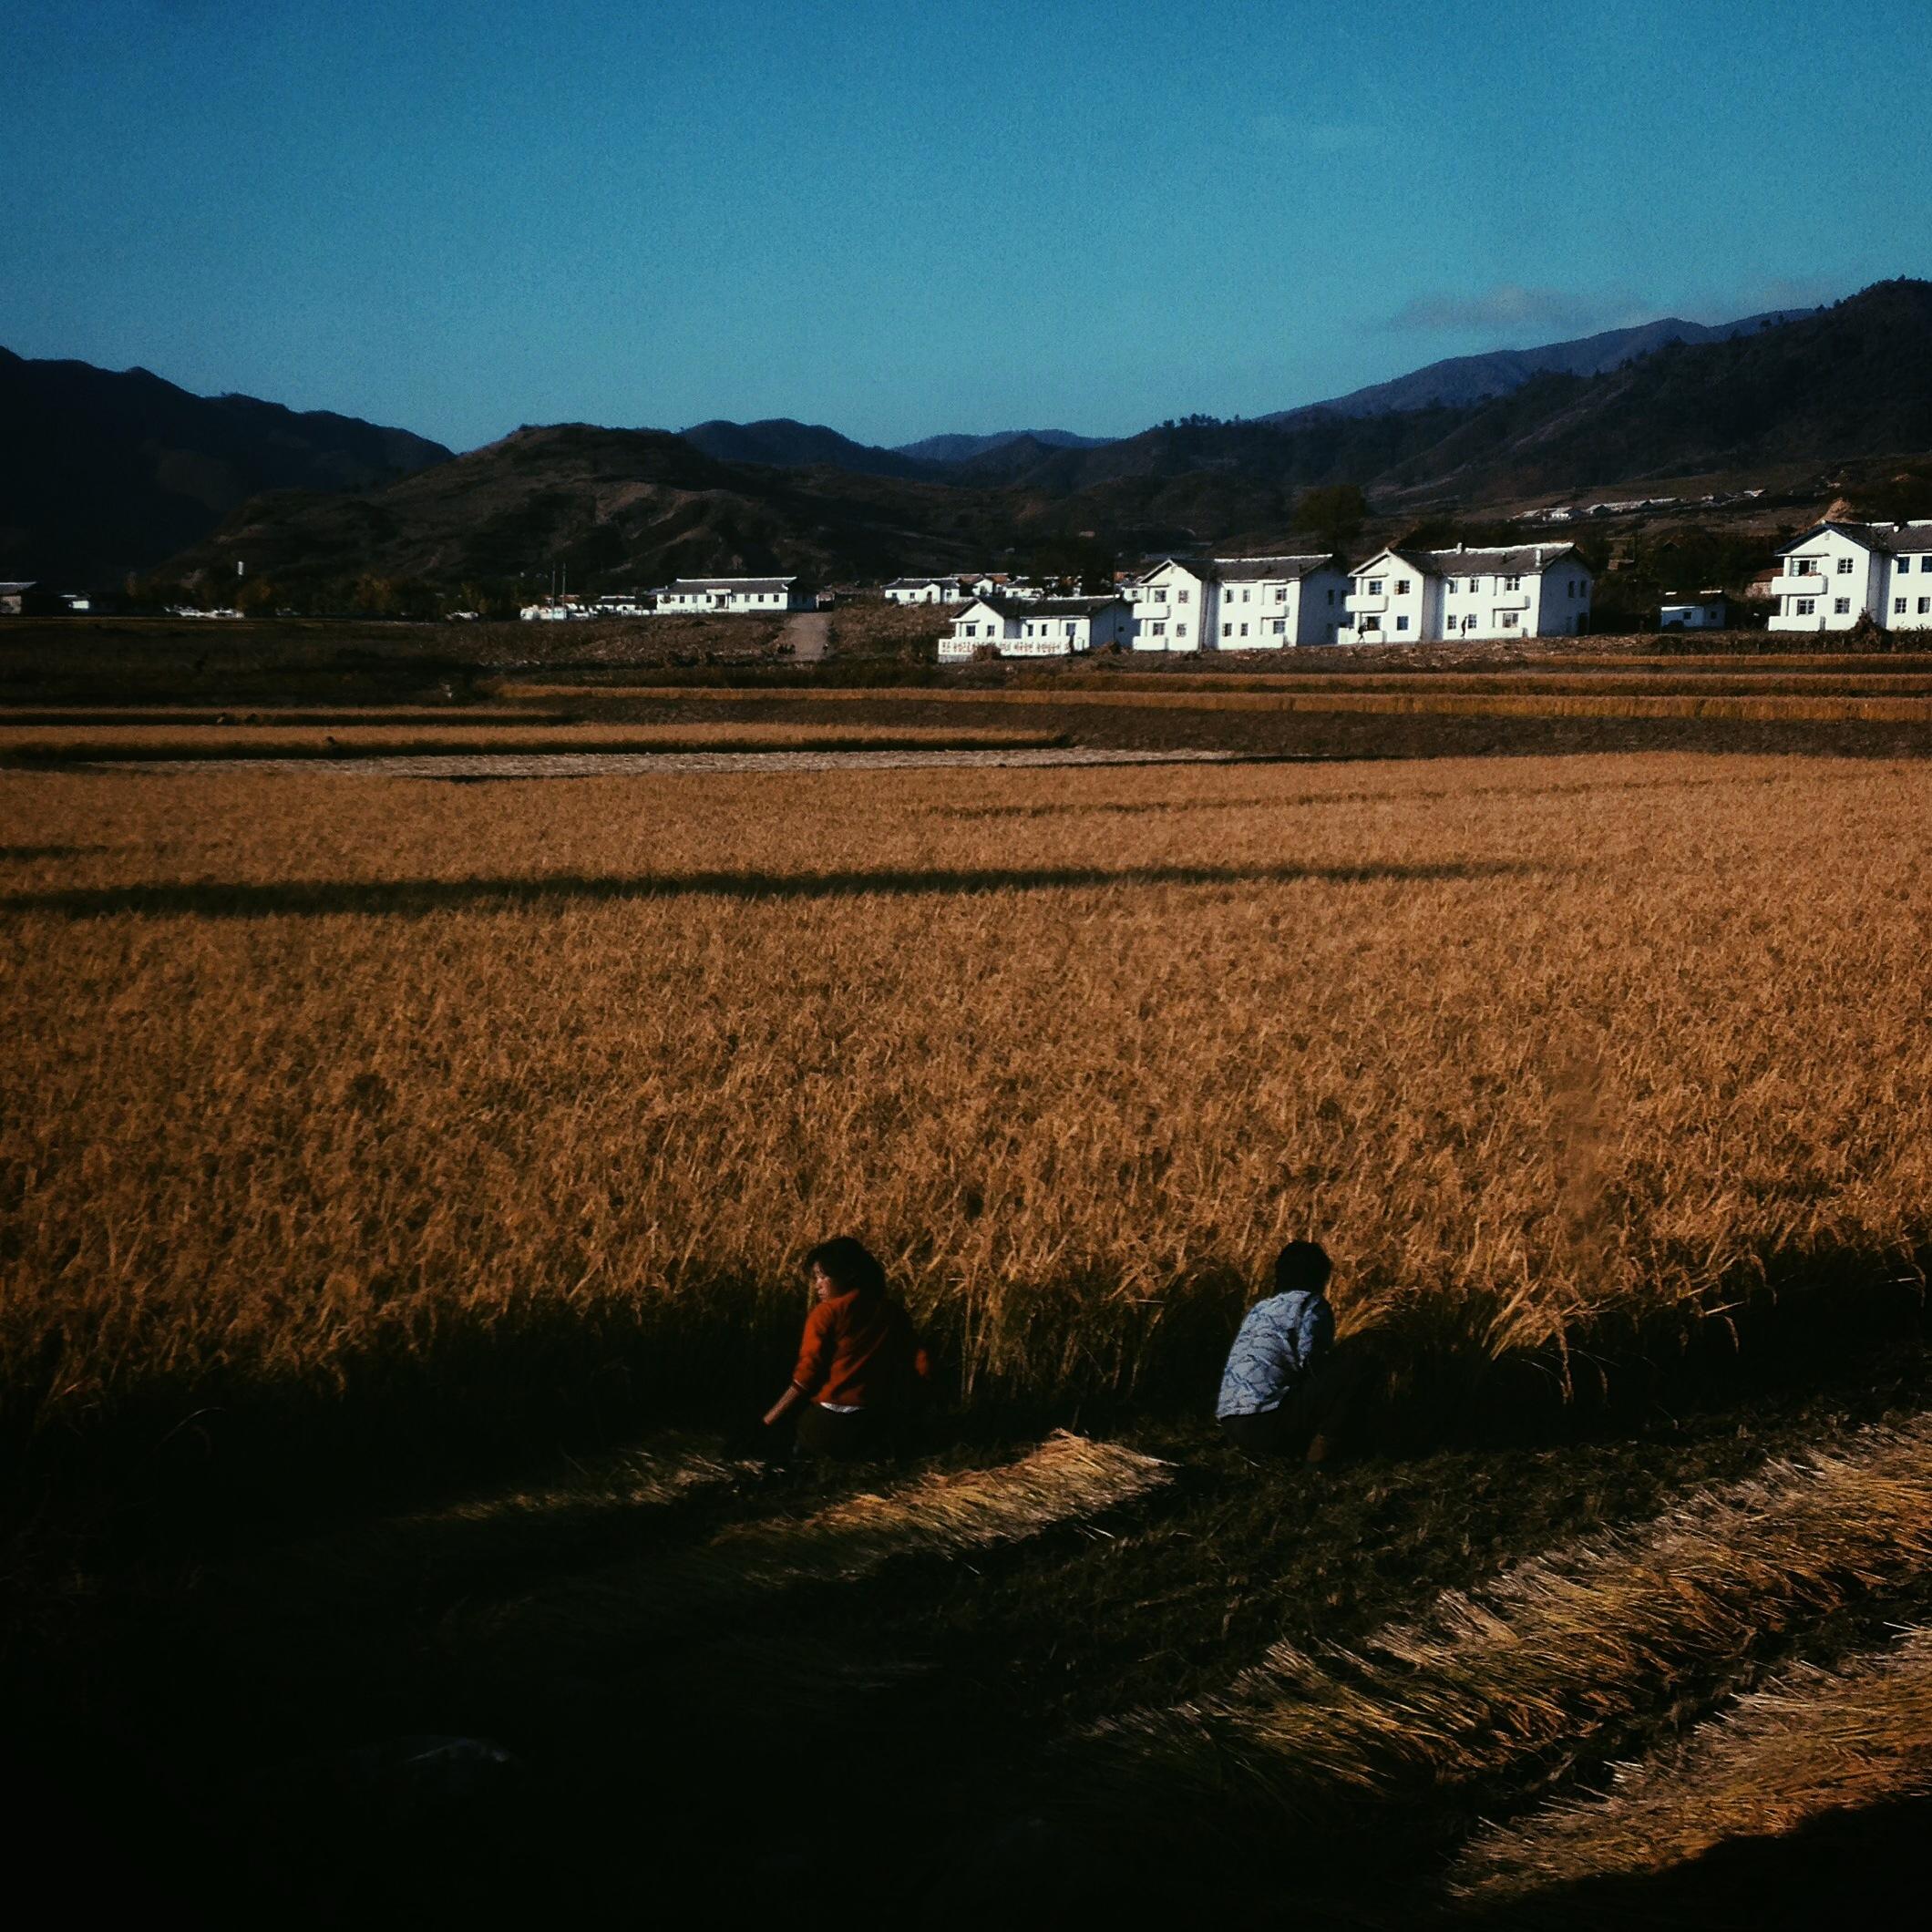 Harvest time outside a village near North Korea's Mt. Kumgang.